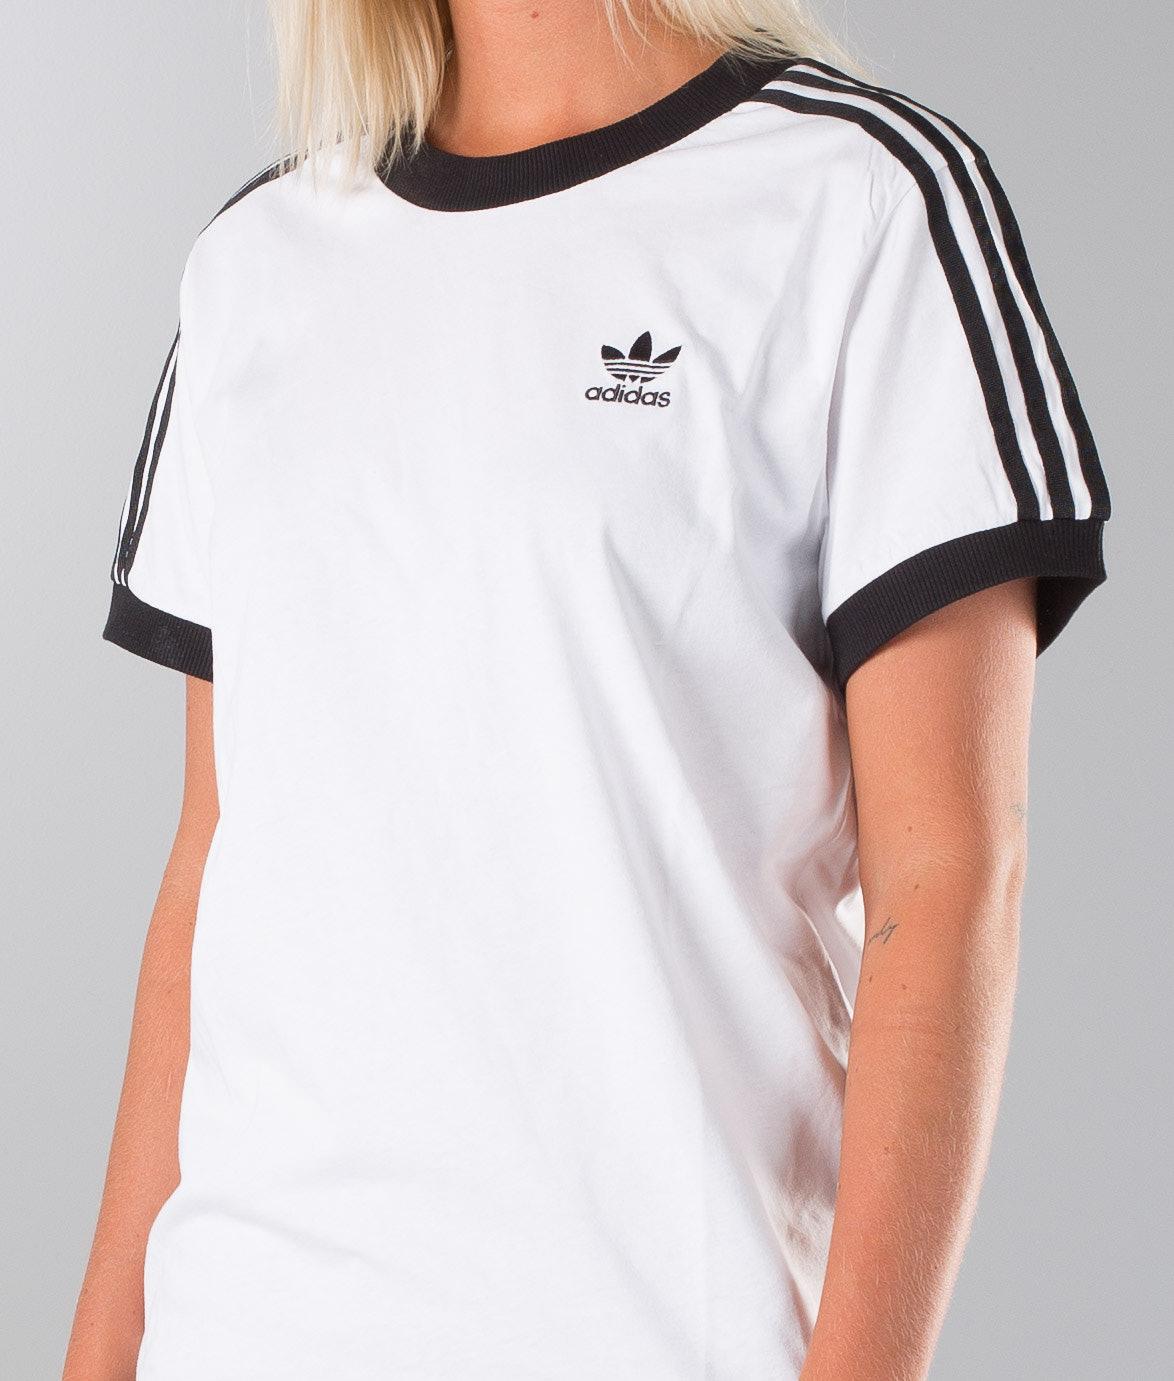 23c40bb1f07 Adidas Originals 3 Stripes T-shirt White - Ridestore.nl